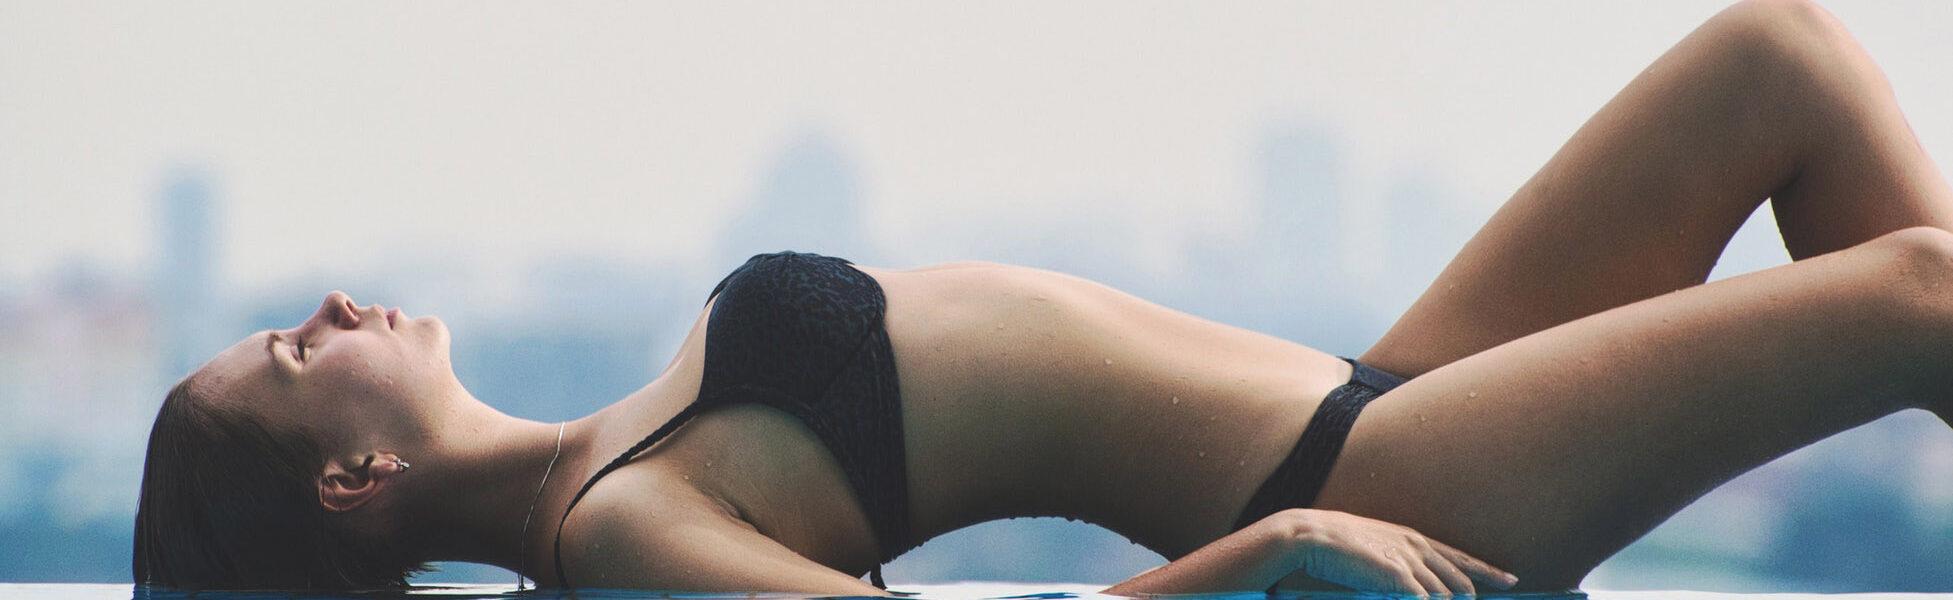 haarentfernung-bikini-bocholt